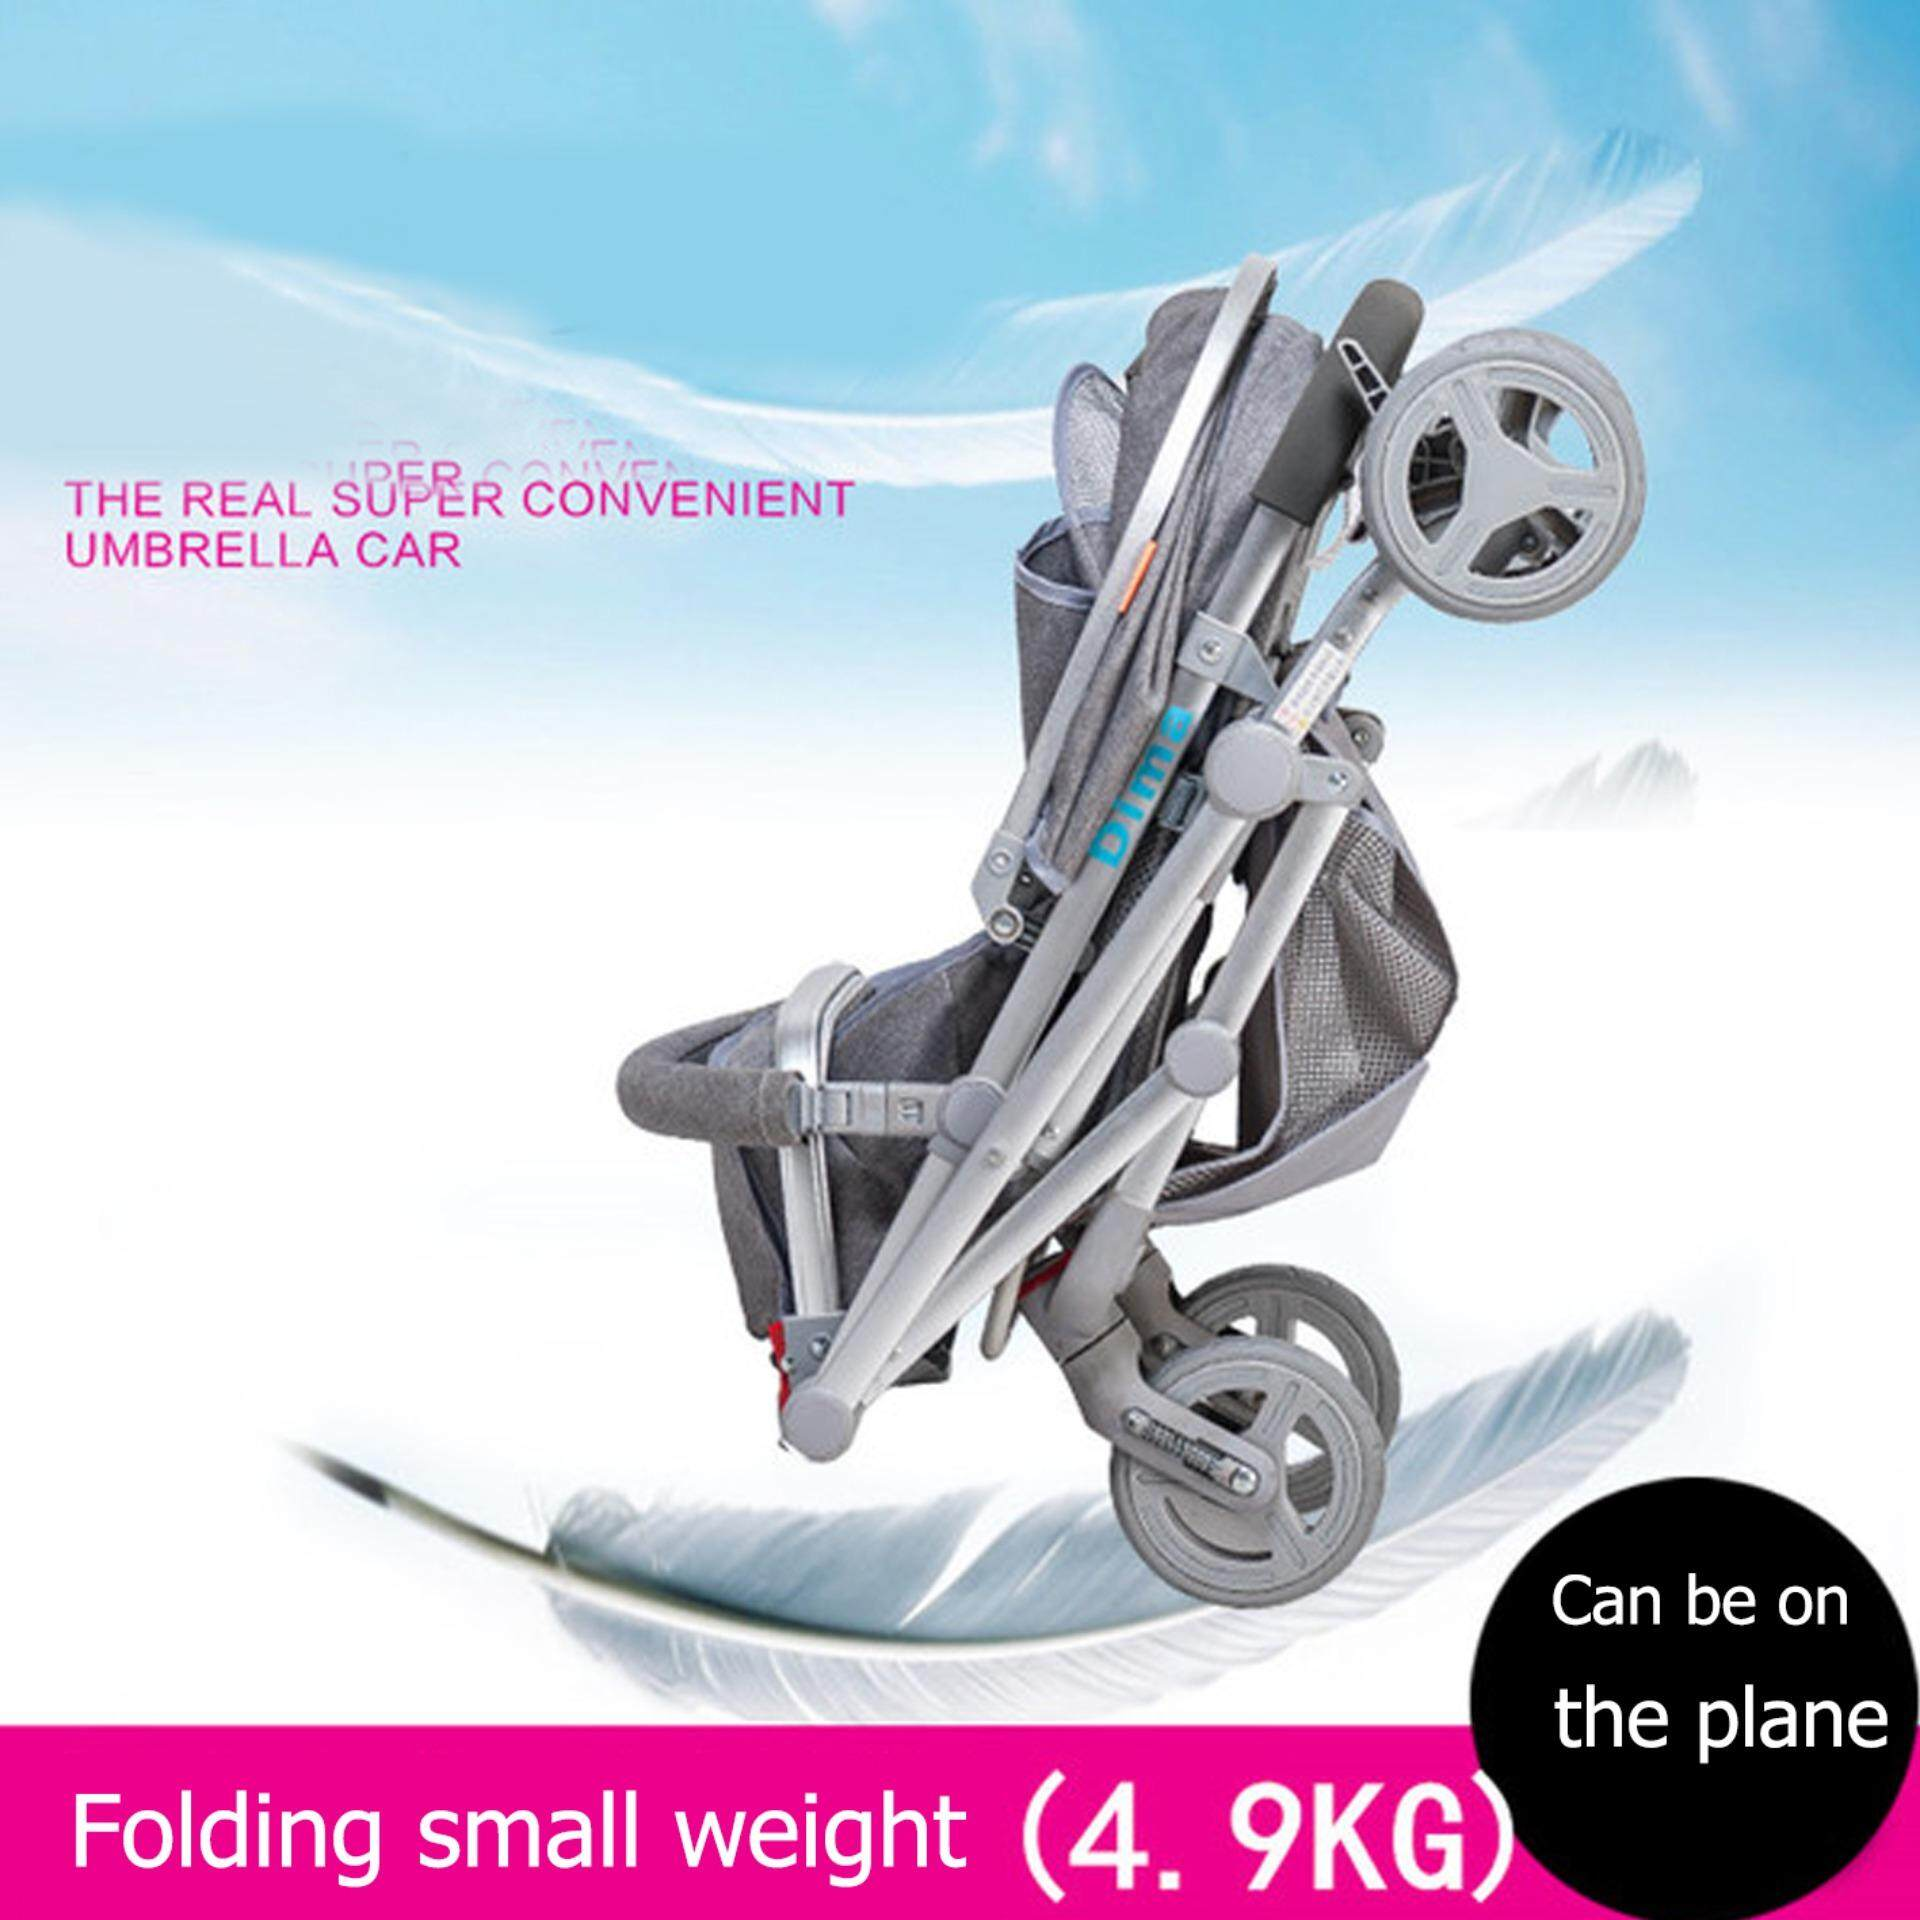 Review VAKIND อุปกรณ์เสริมรถเข็นเด็ก รถเข็นเด็กทารกรถเข็นเด็กทารกเบาะนั่งเบาะผ้าฝ้ายพรมขาวดอทสีม่วง เปรียบเทียบราคาที่ดีที่สุด